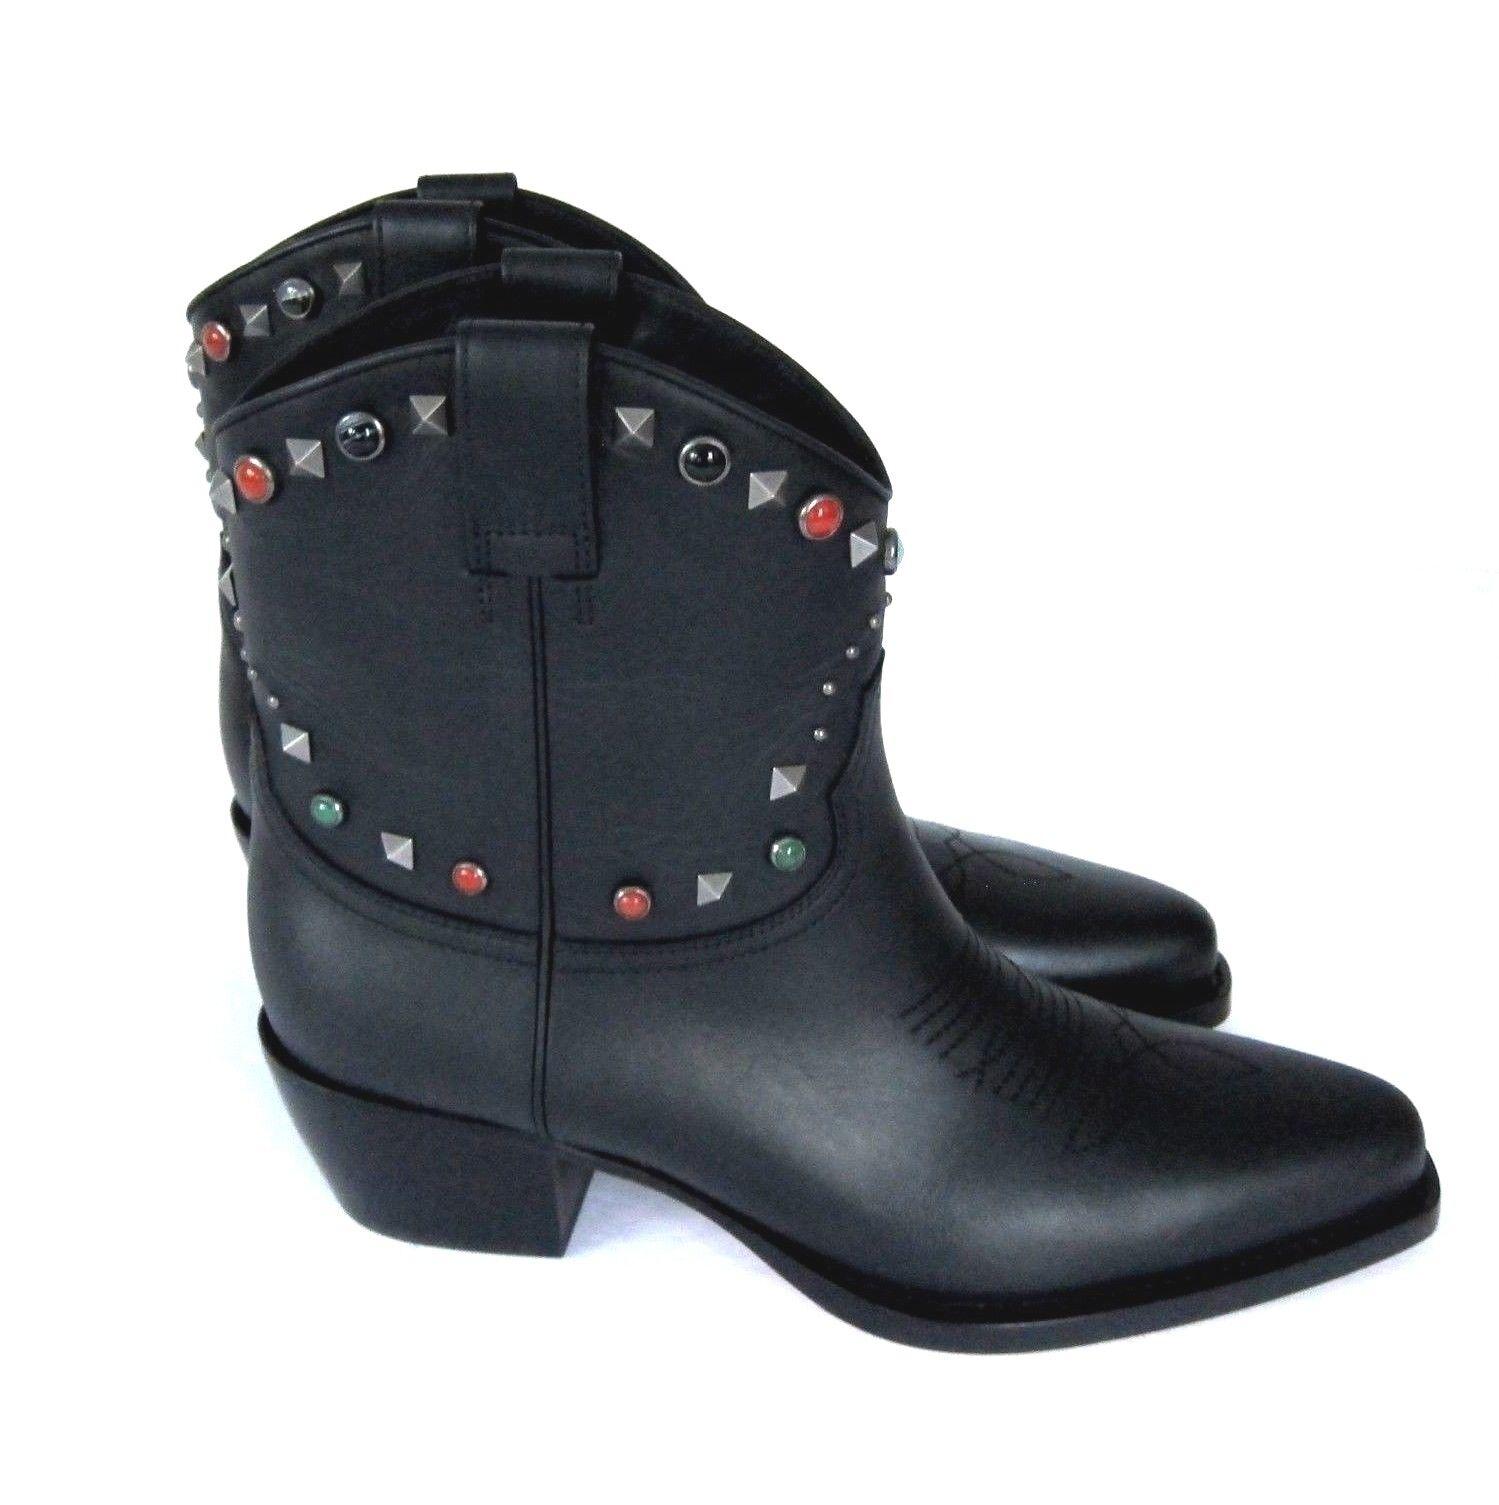 J-2885237 New Valentino Garavani Black Western Ankle Boots Size US 10 Marked 40